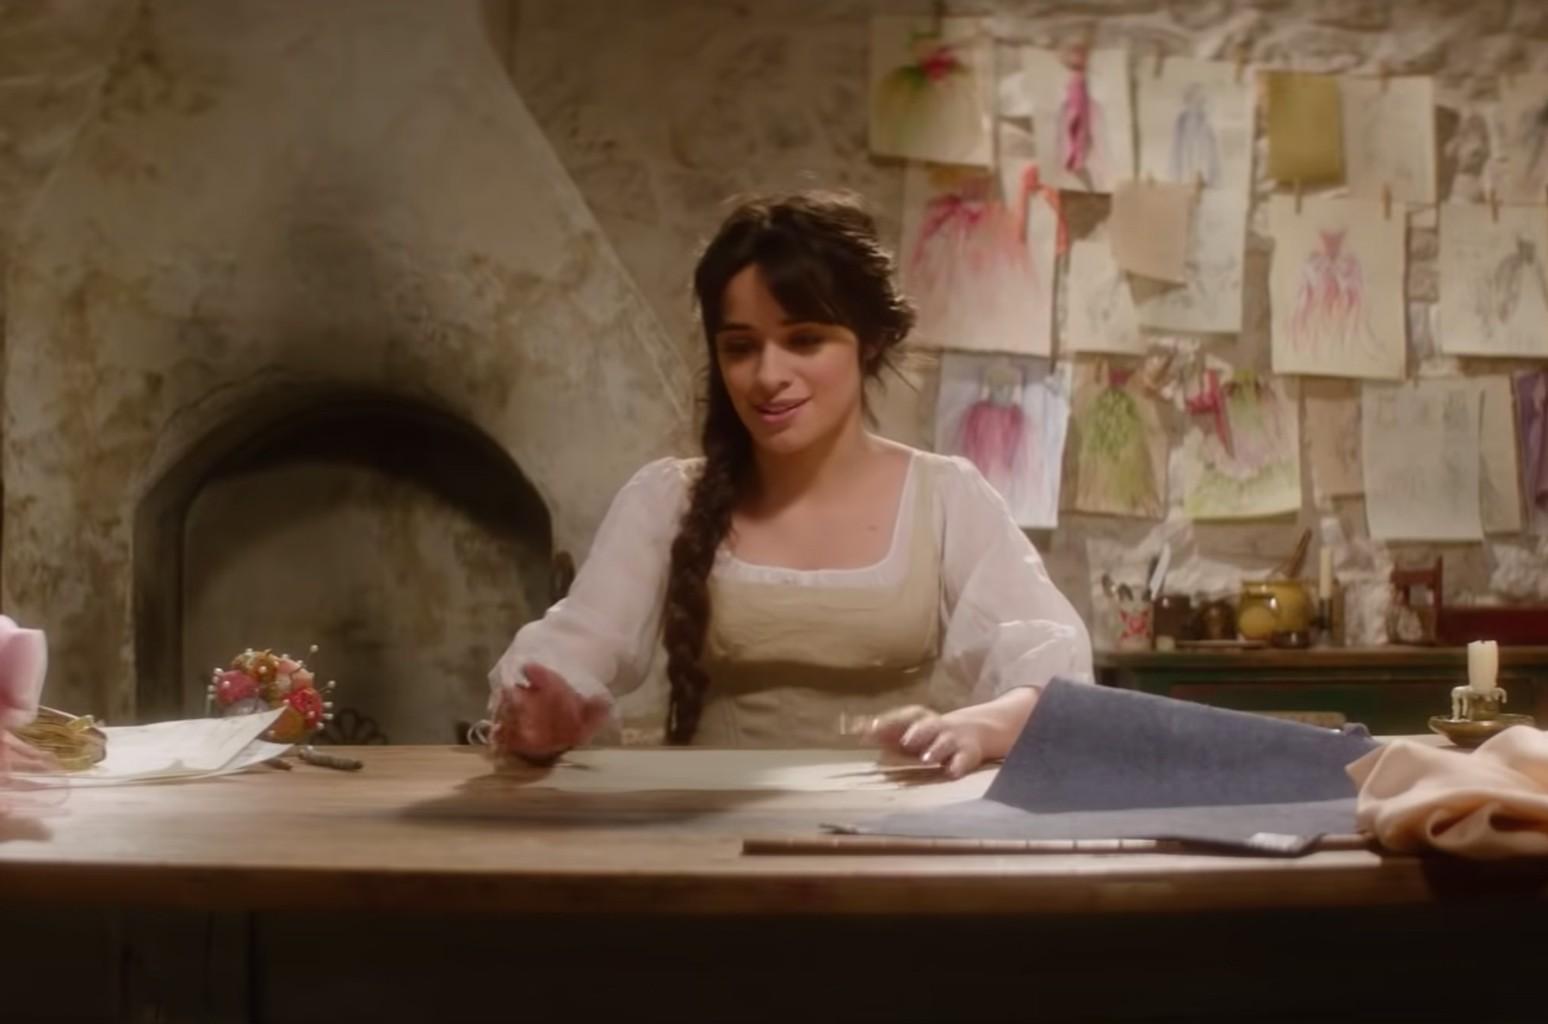 Camila Cabello Chases Her Dreams In 'Cinderella' Movie Trailer: Watch